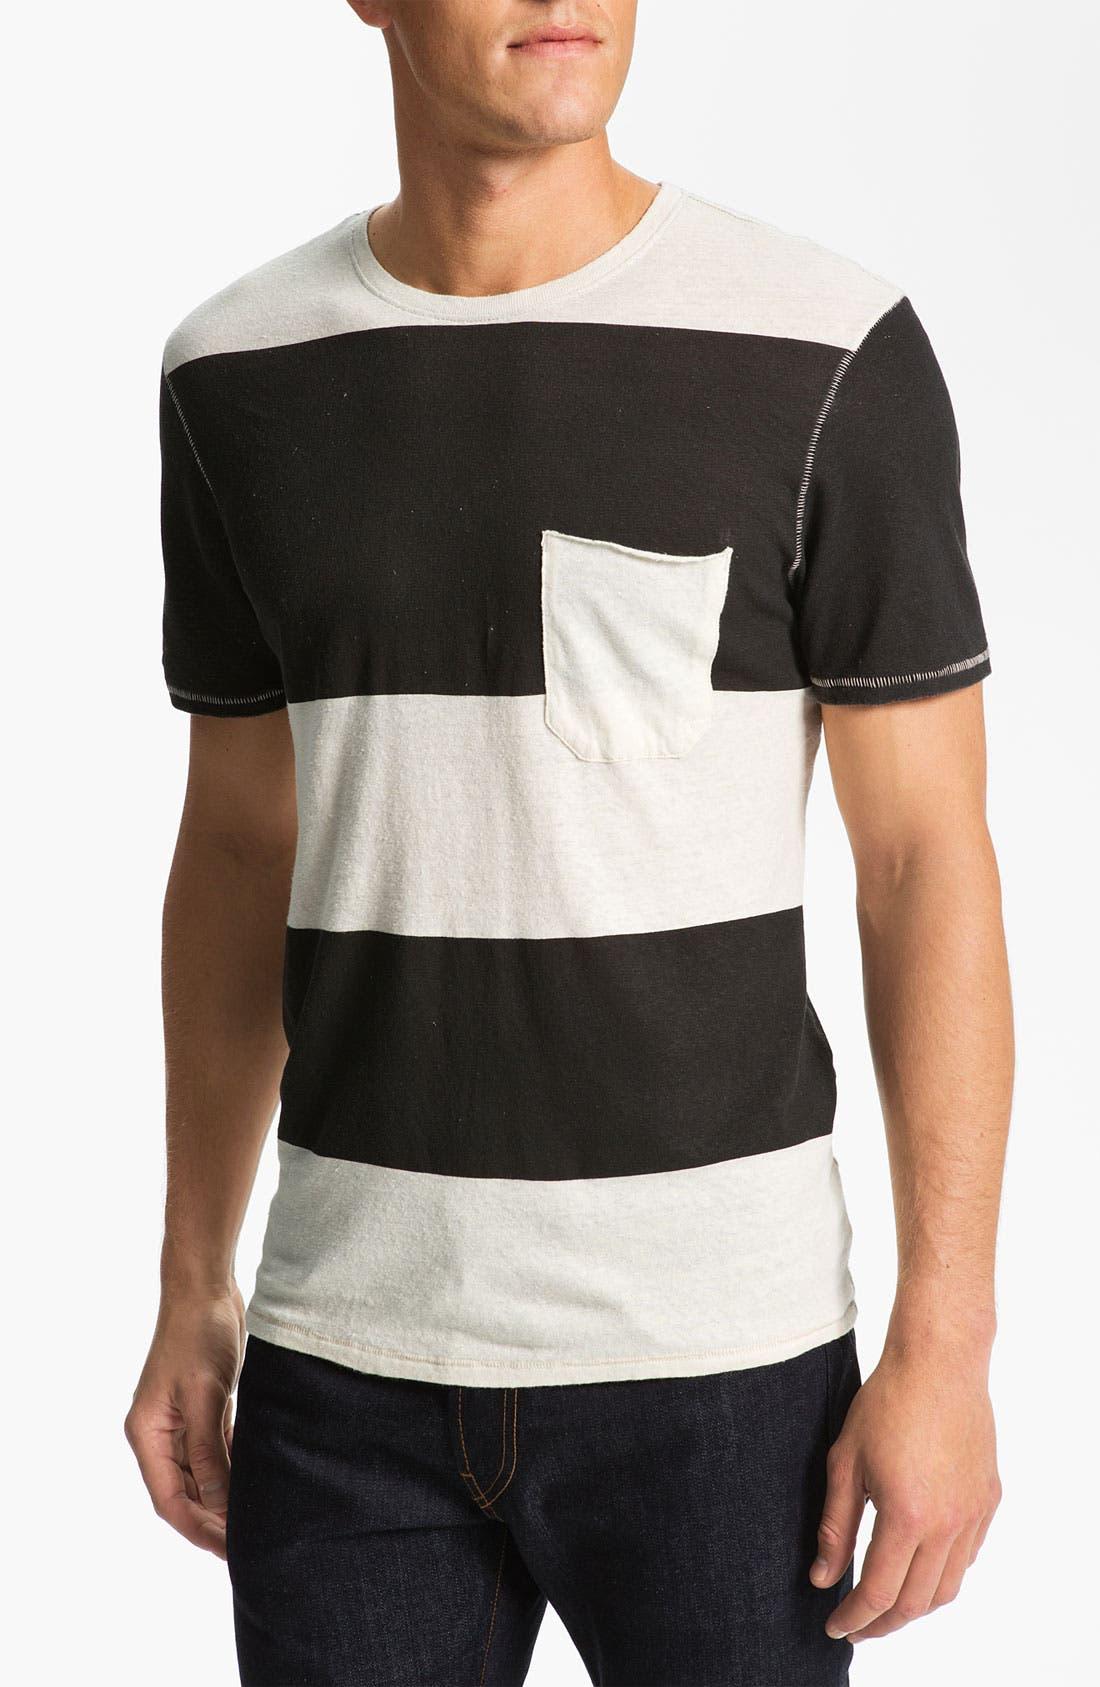 Main Image - R44 Rogan Standard Issue 'Condor' T-Shirt